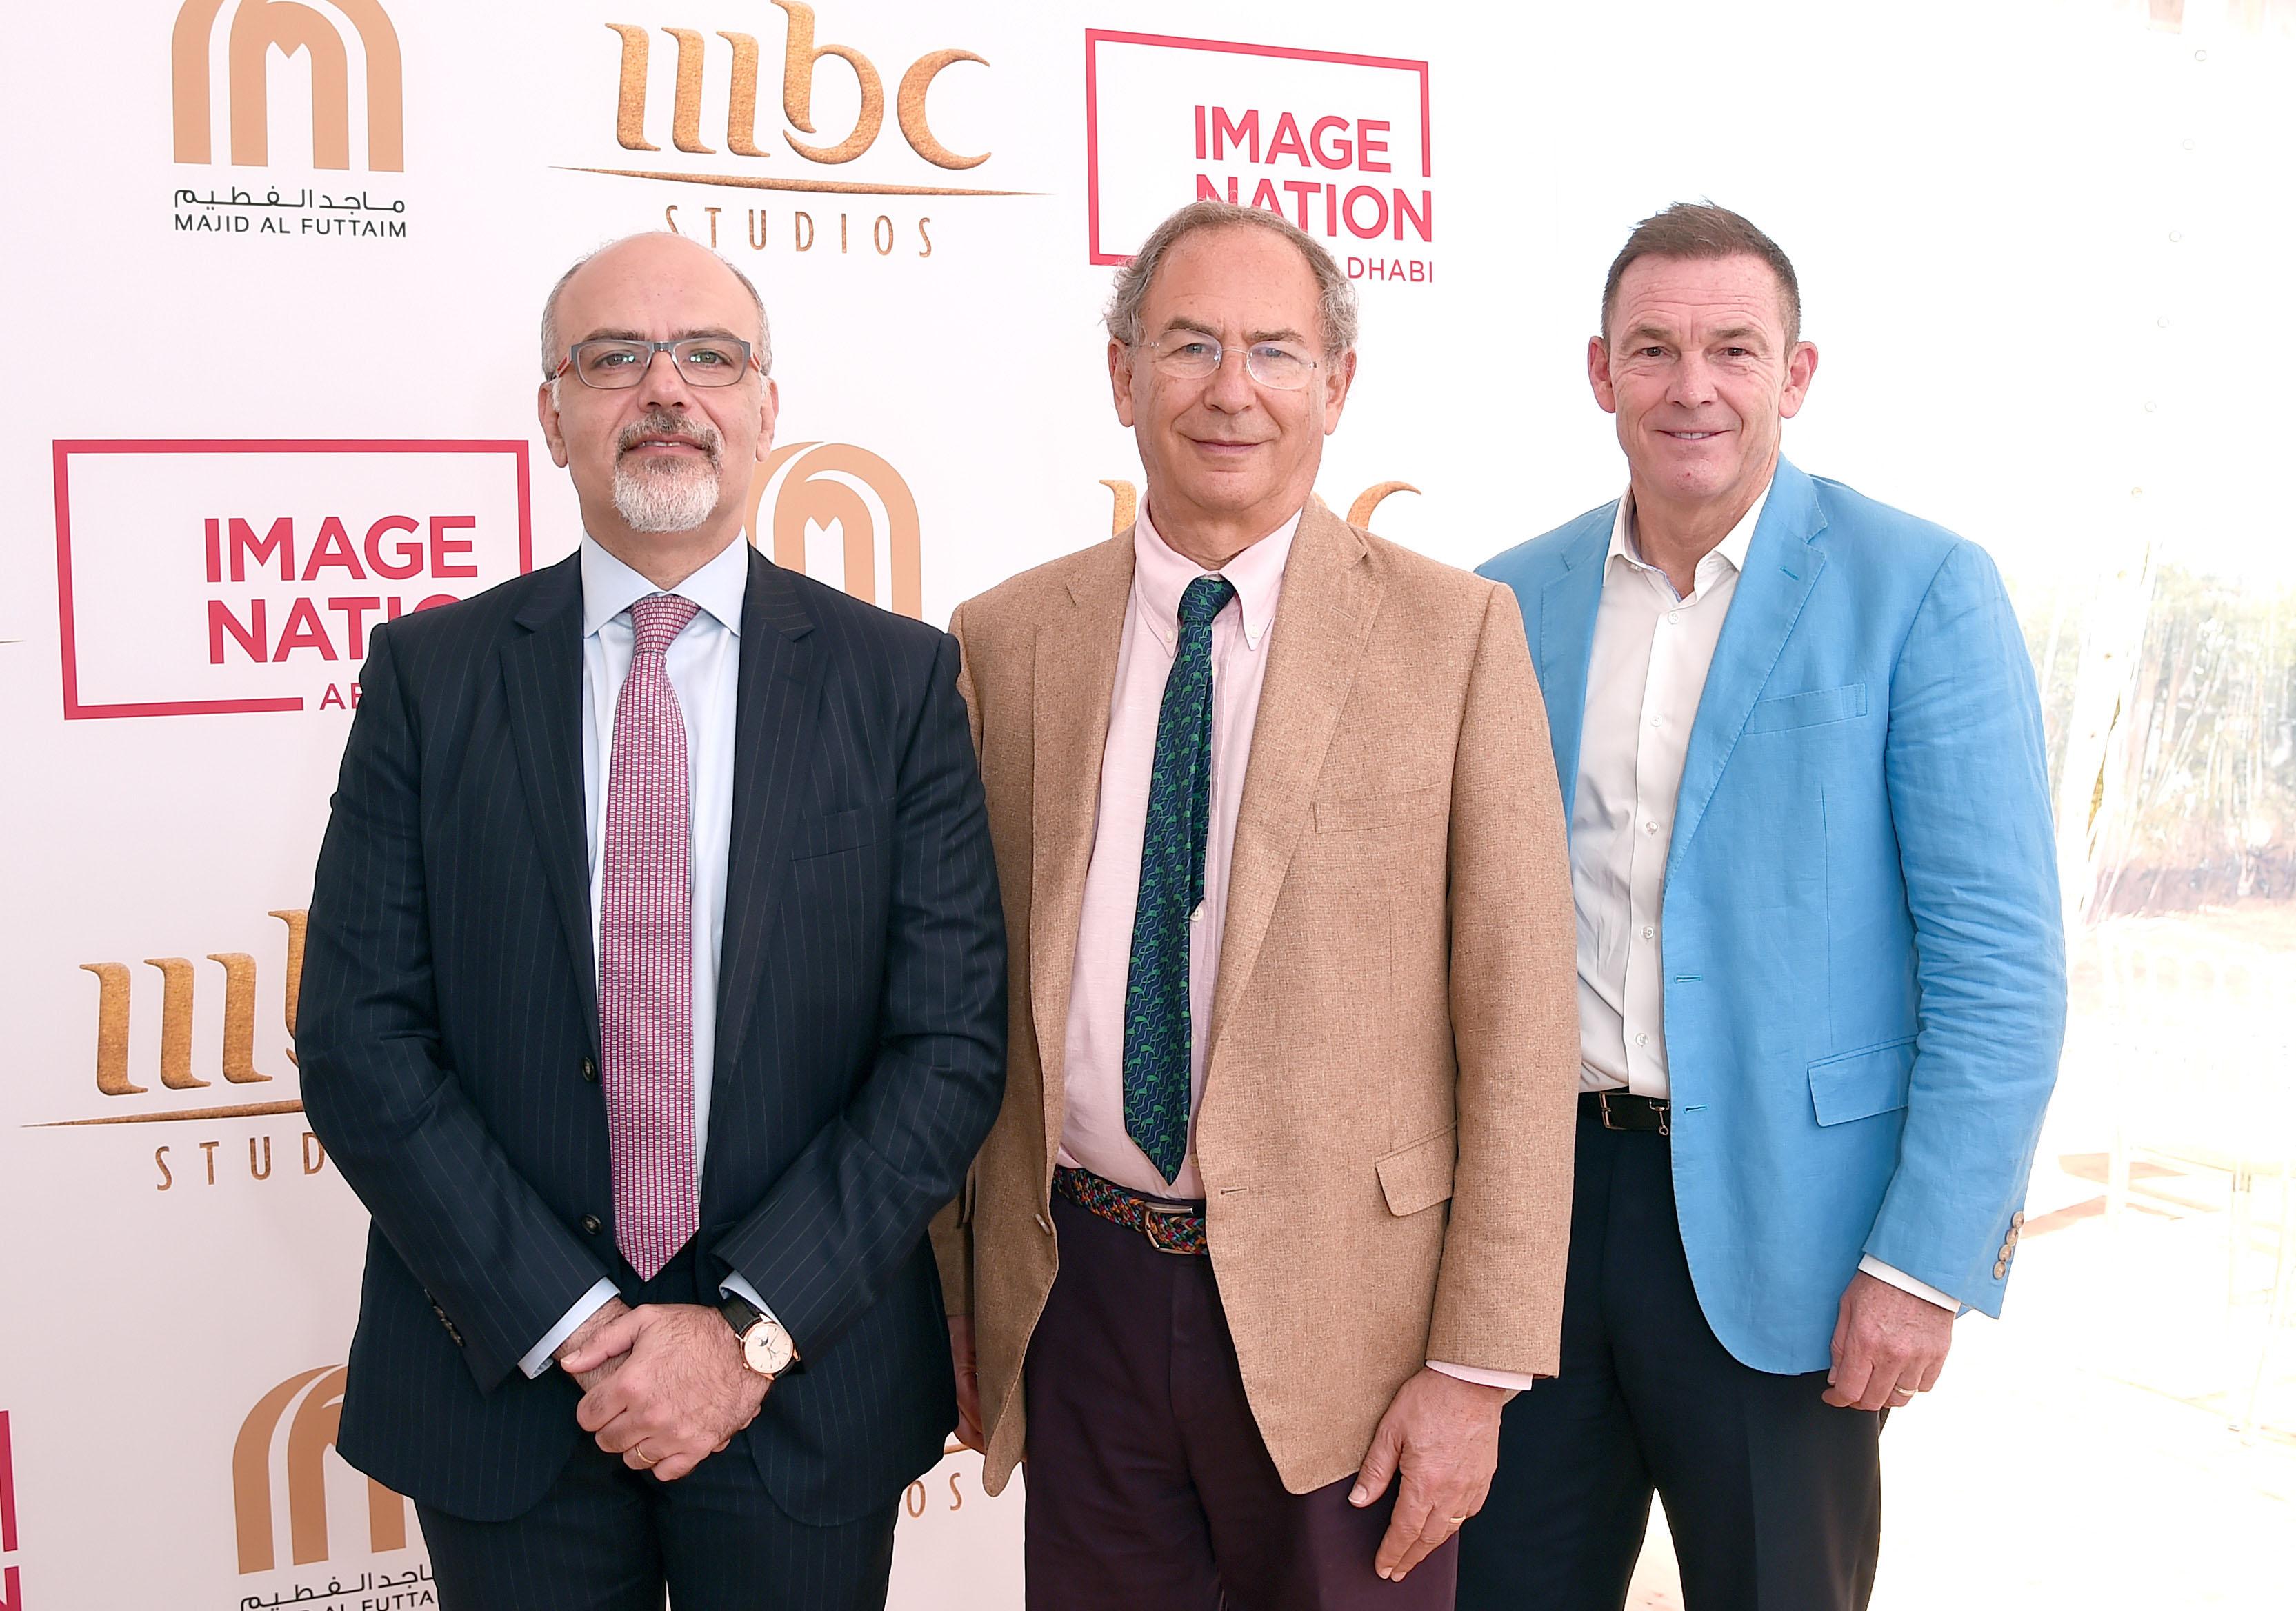 nation-abu-dhabi-majid-al-futtaim-and-mbc-studios-signs-partnership